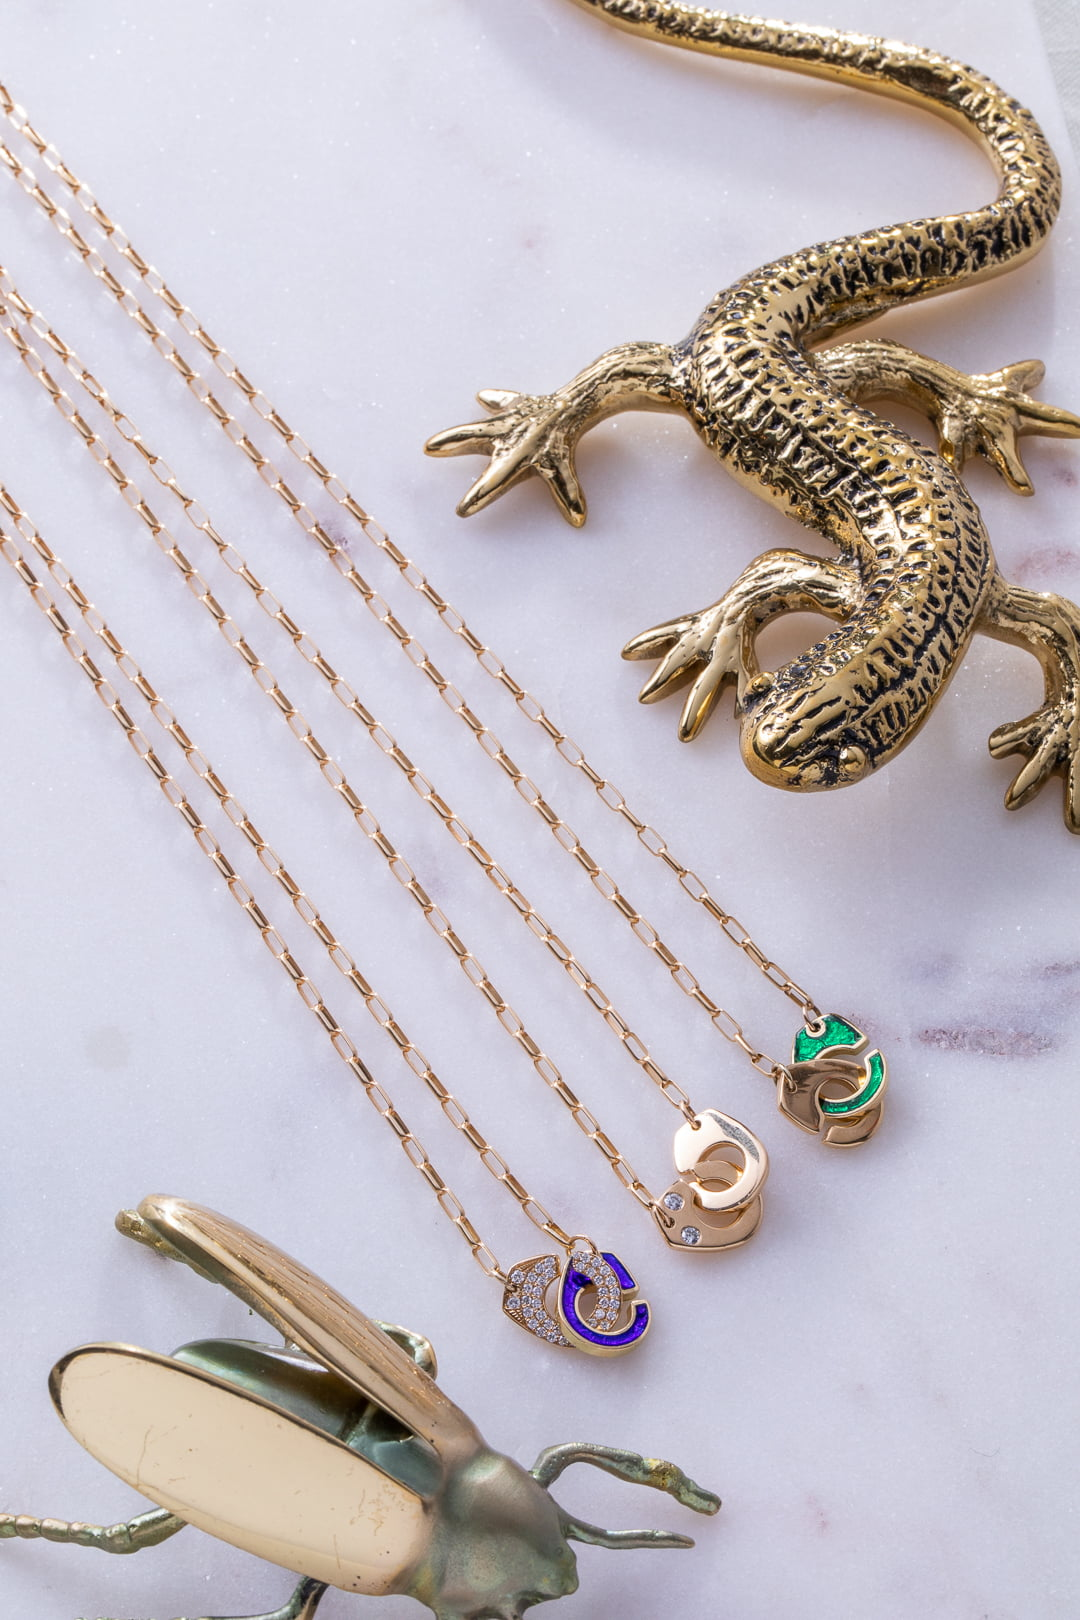 Designer Spotlight: Audrey C. Jewelry